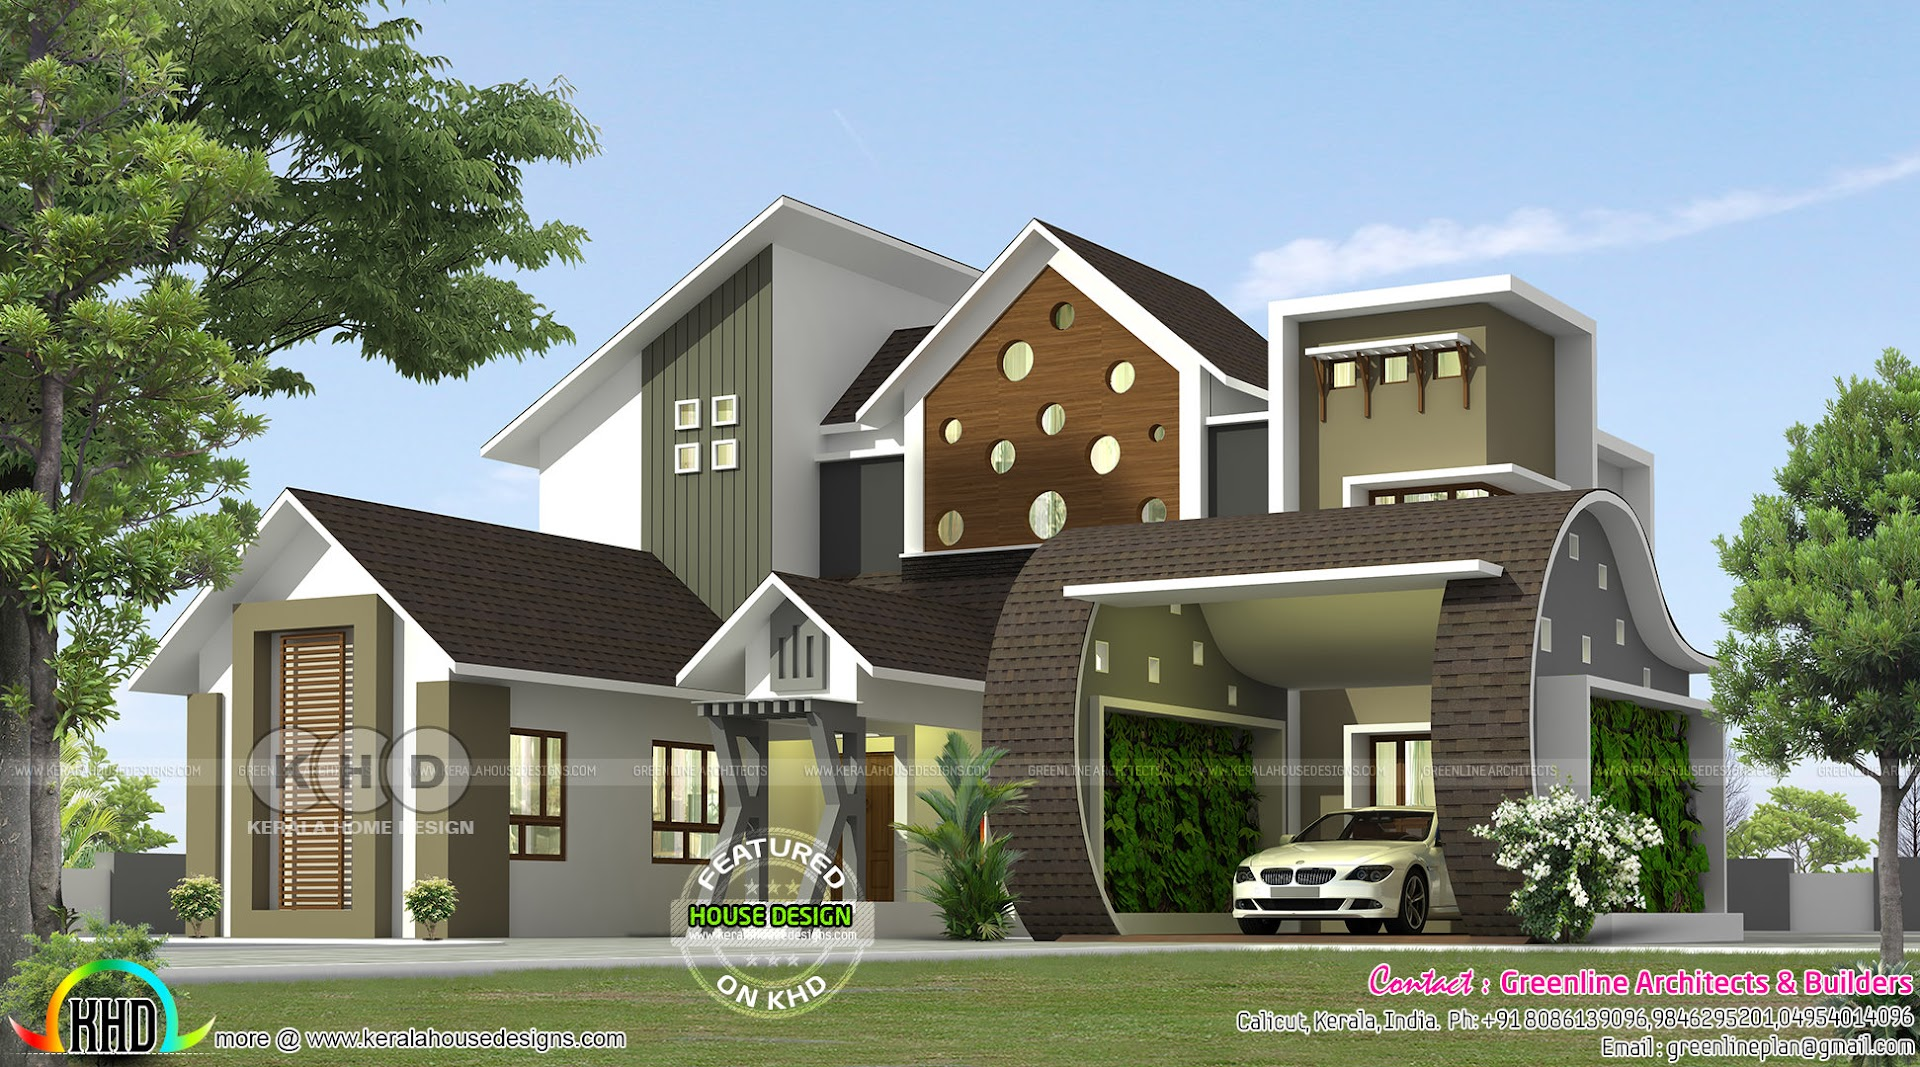 June 2018 House Designs Starts Here Ultra Modern Home